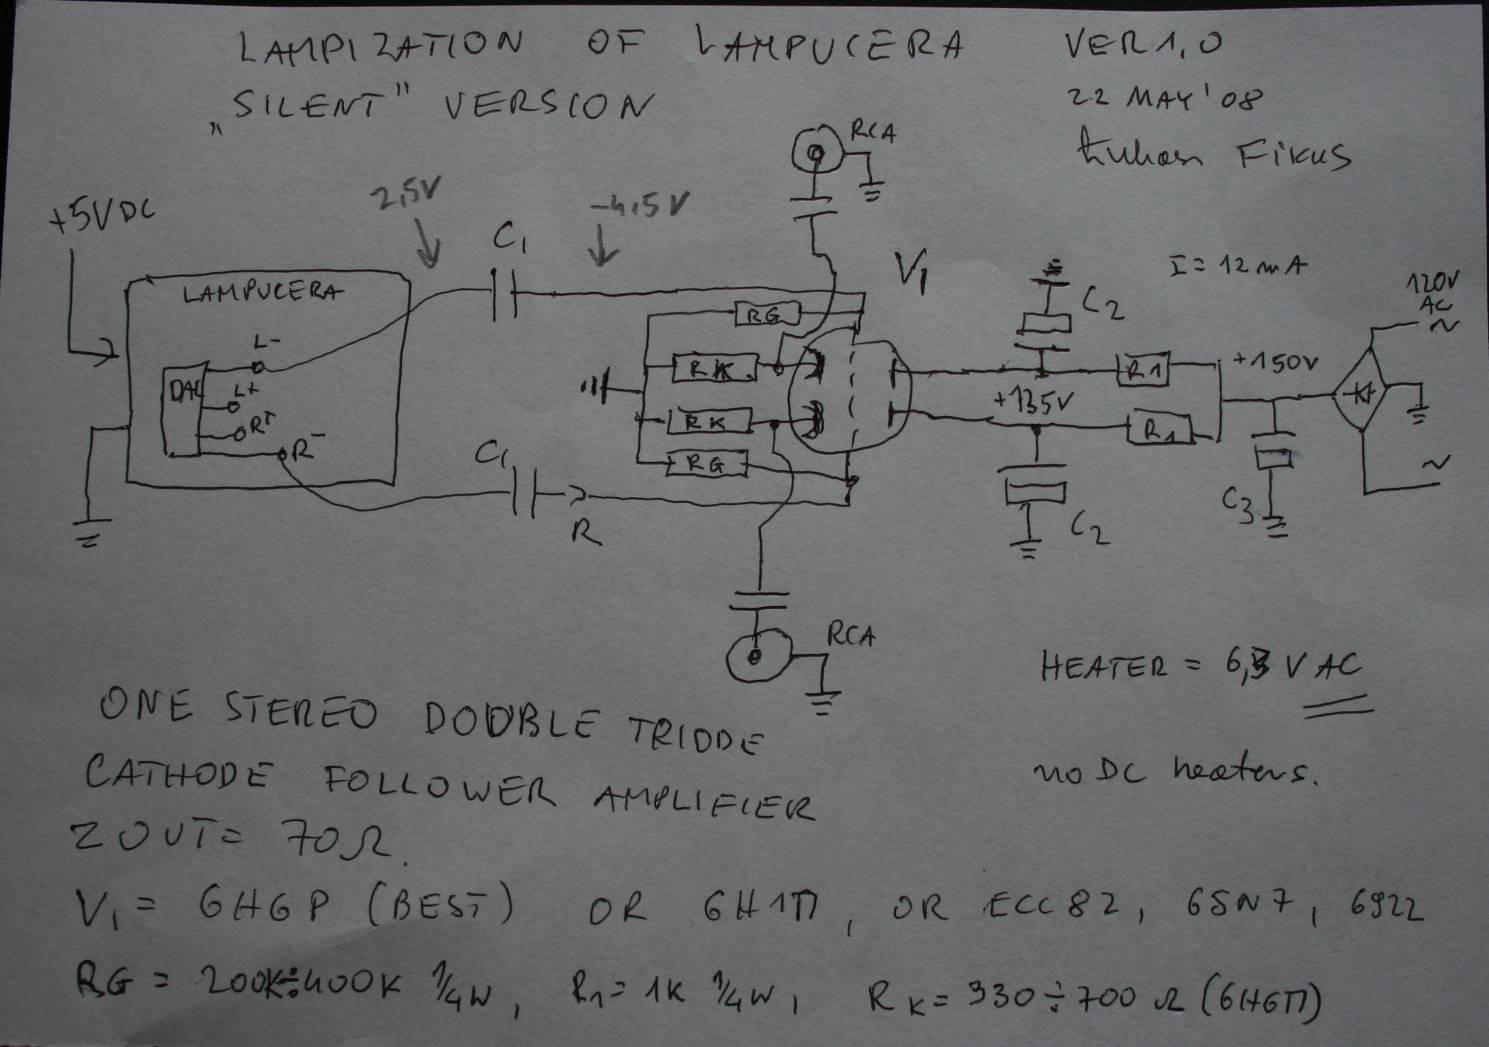 Avclub Shunt Voltage Regulator Circuit Http Wwwtubecadcom 2010 12